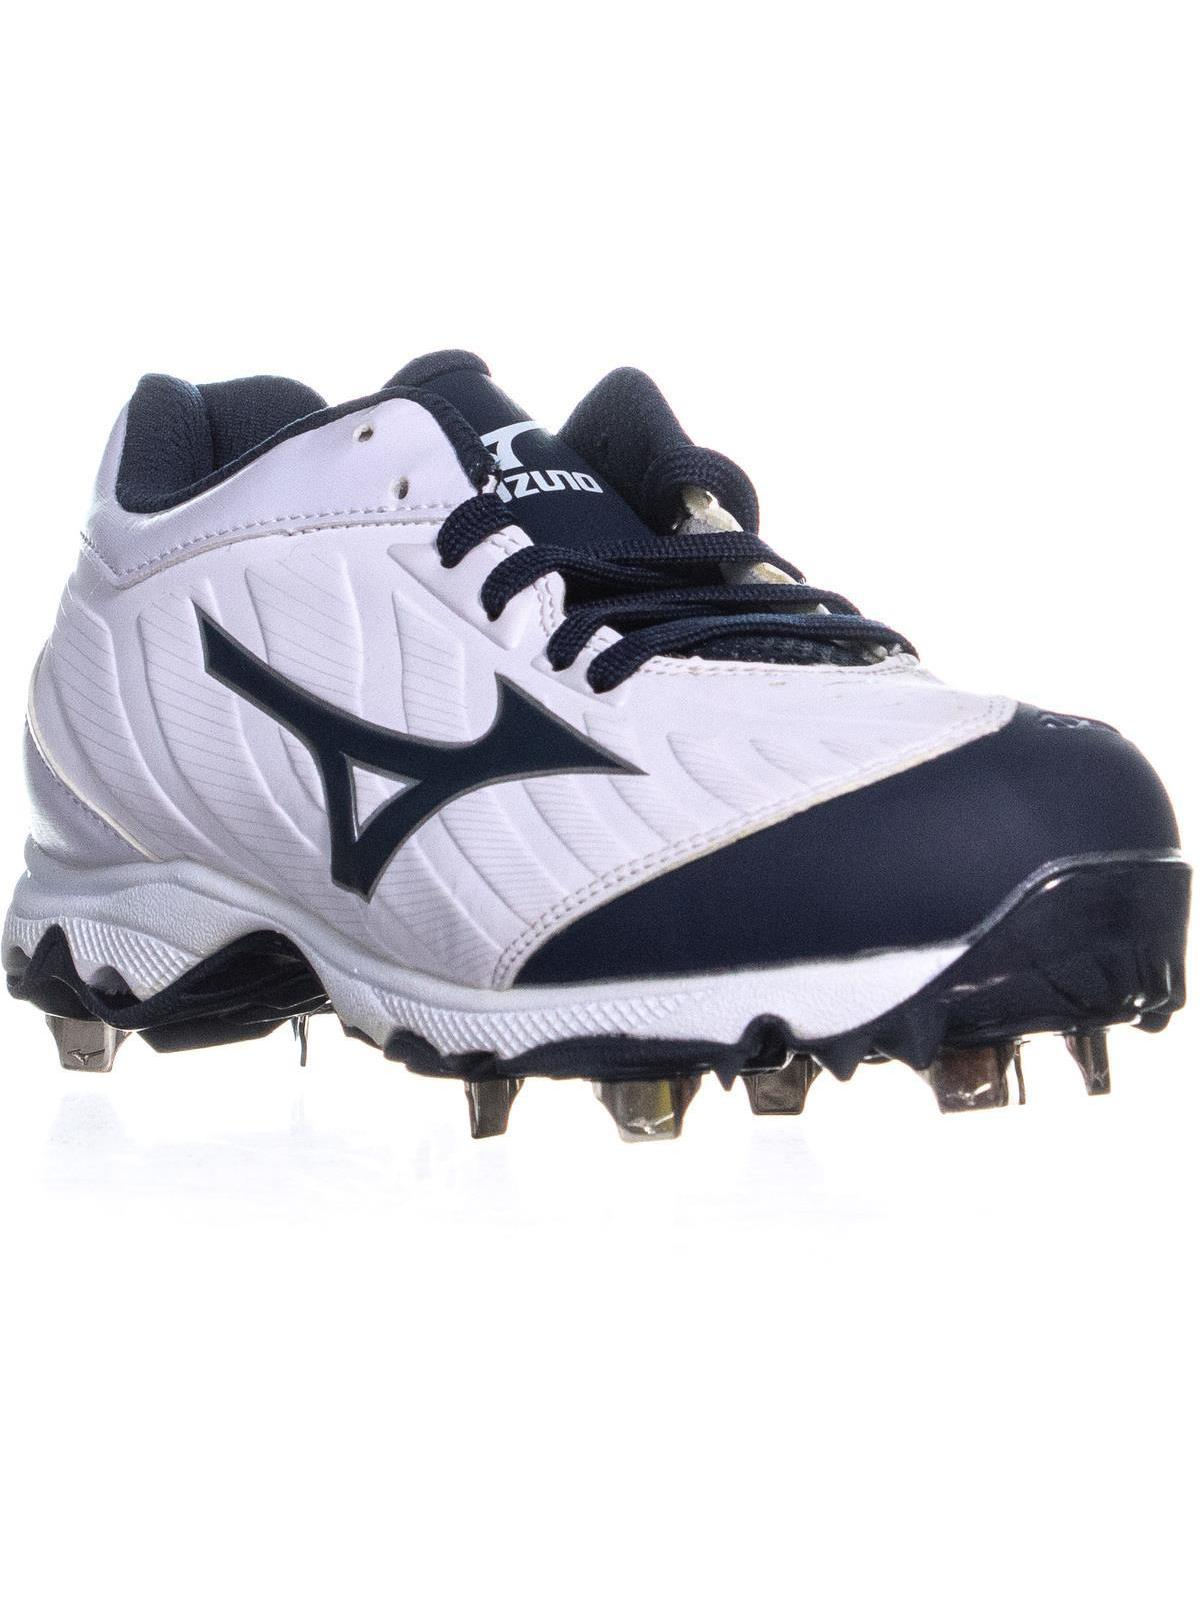 Mizuno 9-Spike Advanced Sweep 3 Softball Sneakers a76b20711999